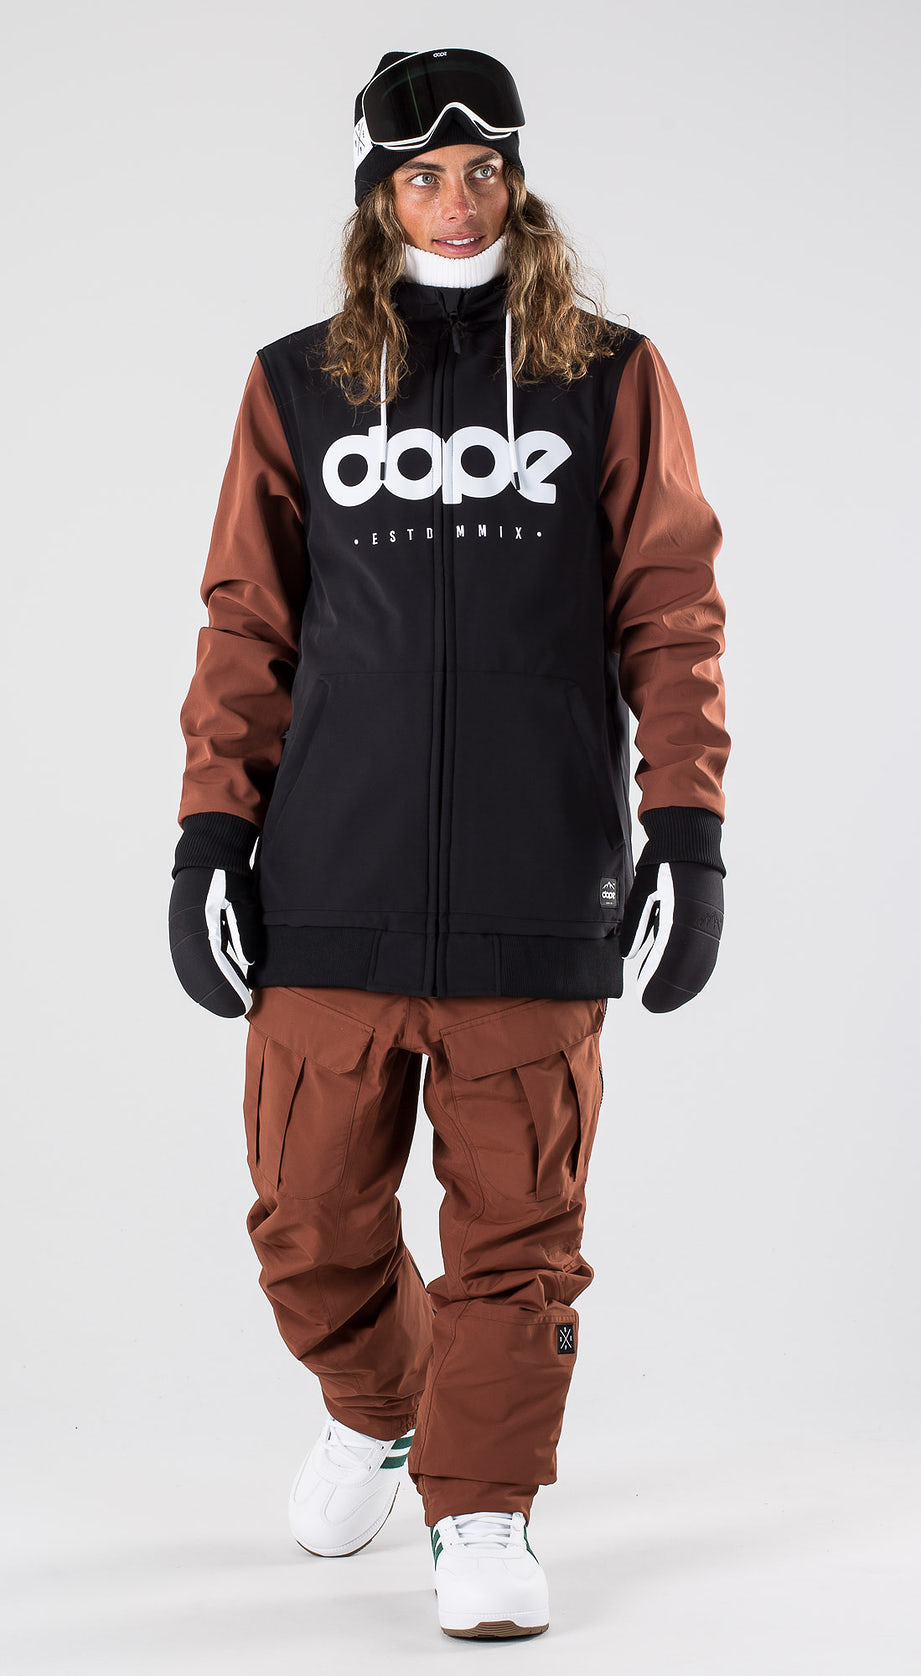 Dope Standard DO Black/Adobe Snowboard clothing Multi